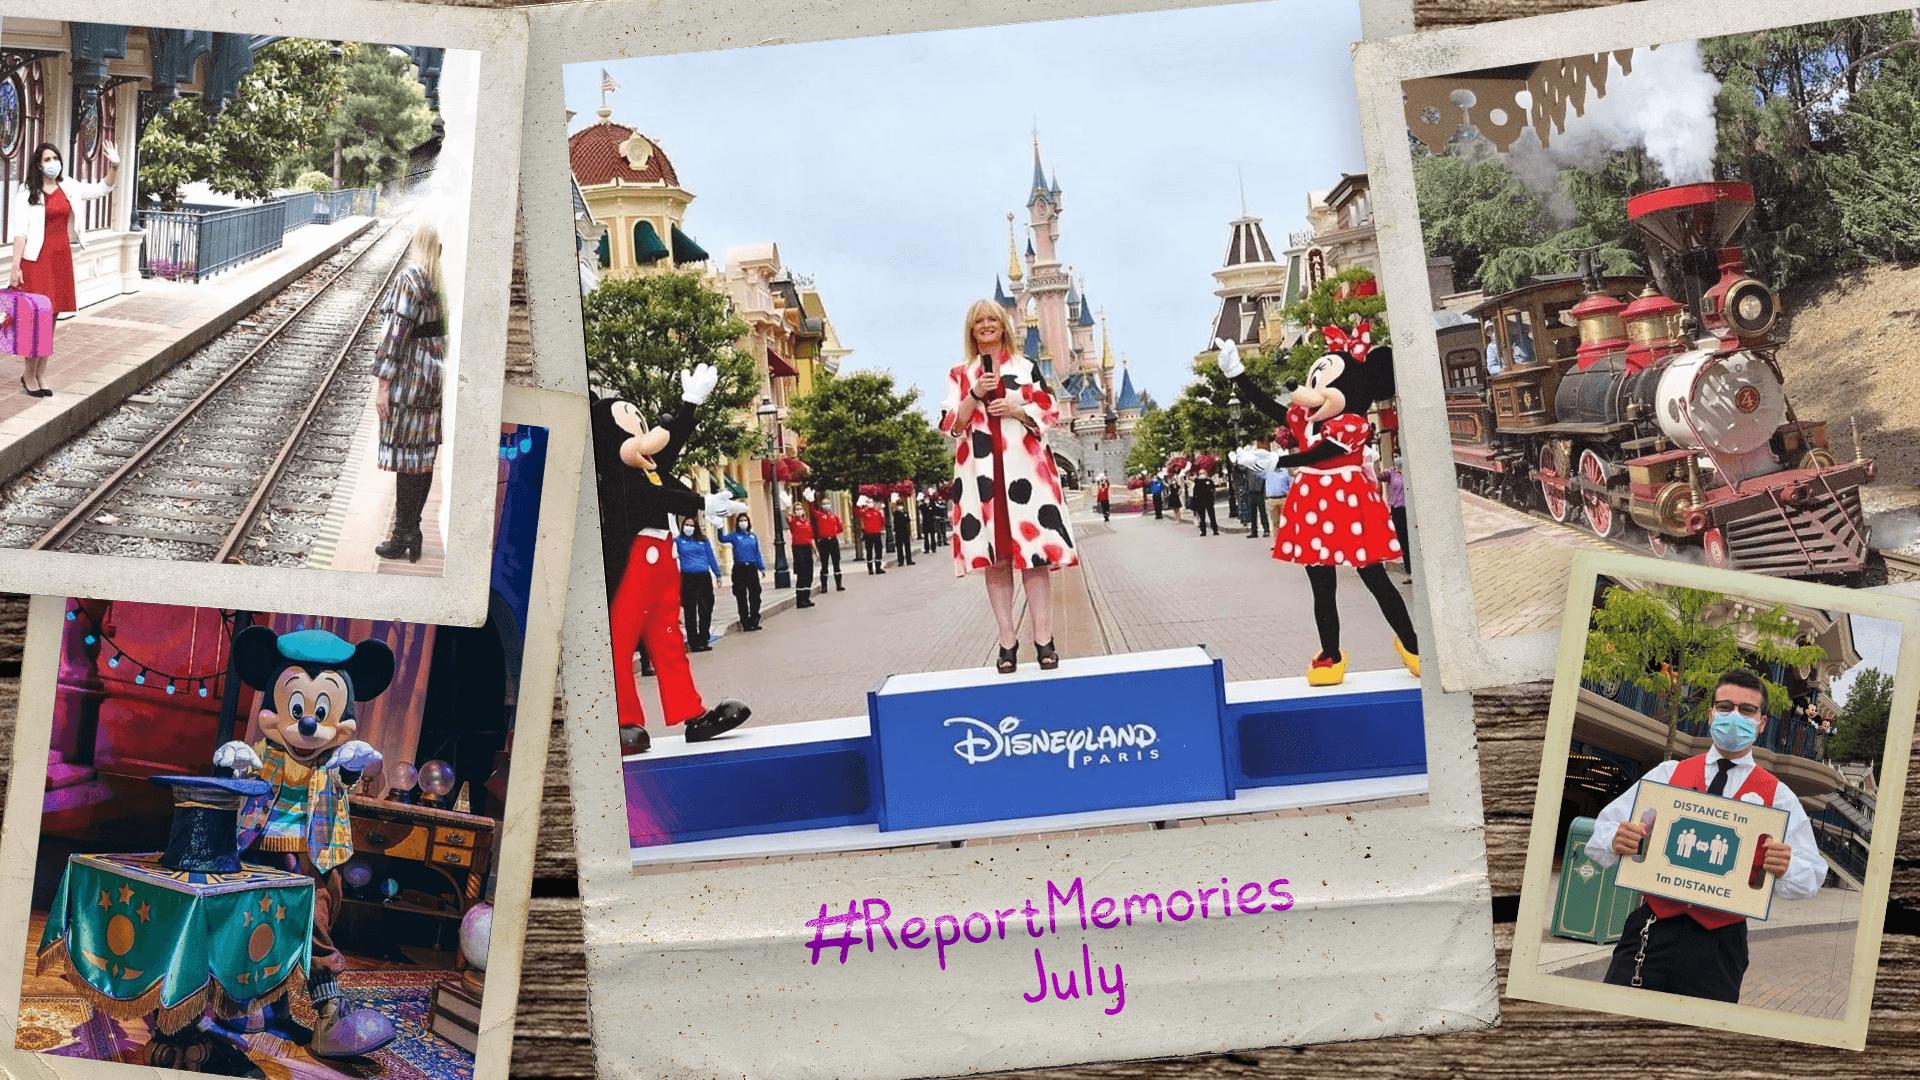 Memories_July